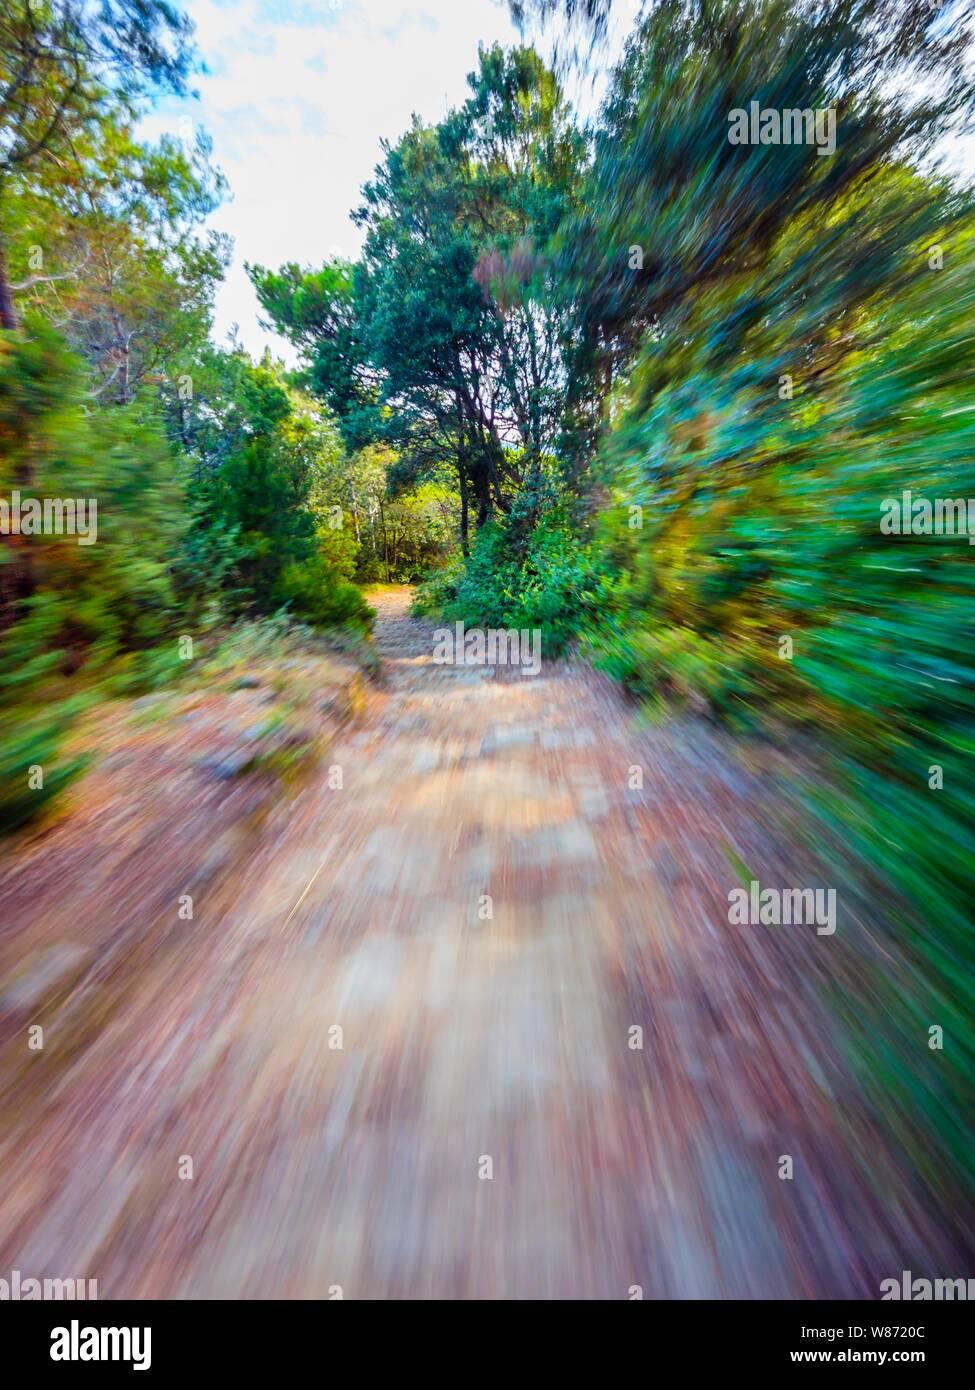 Green forest countryside path pathway speeding through dense trees Stock Photo